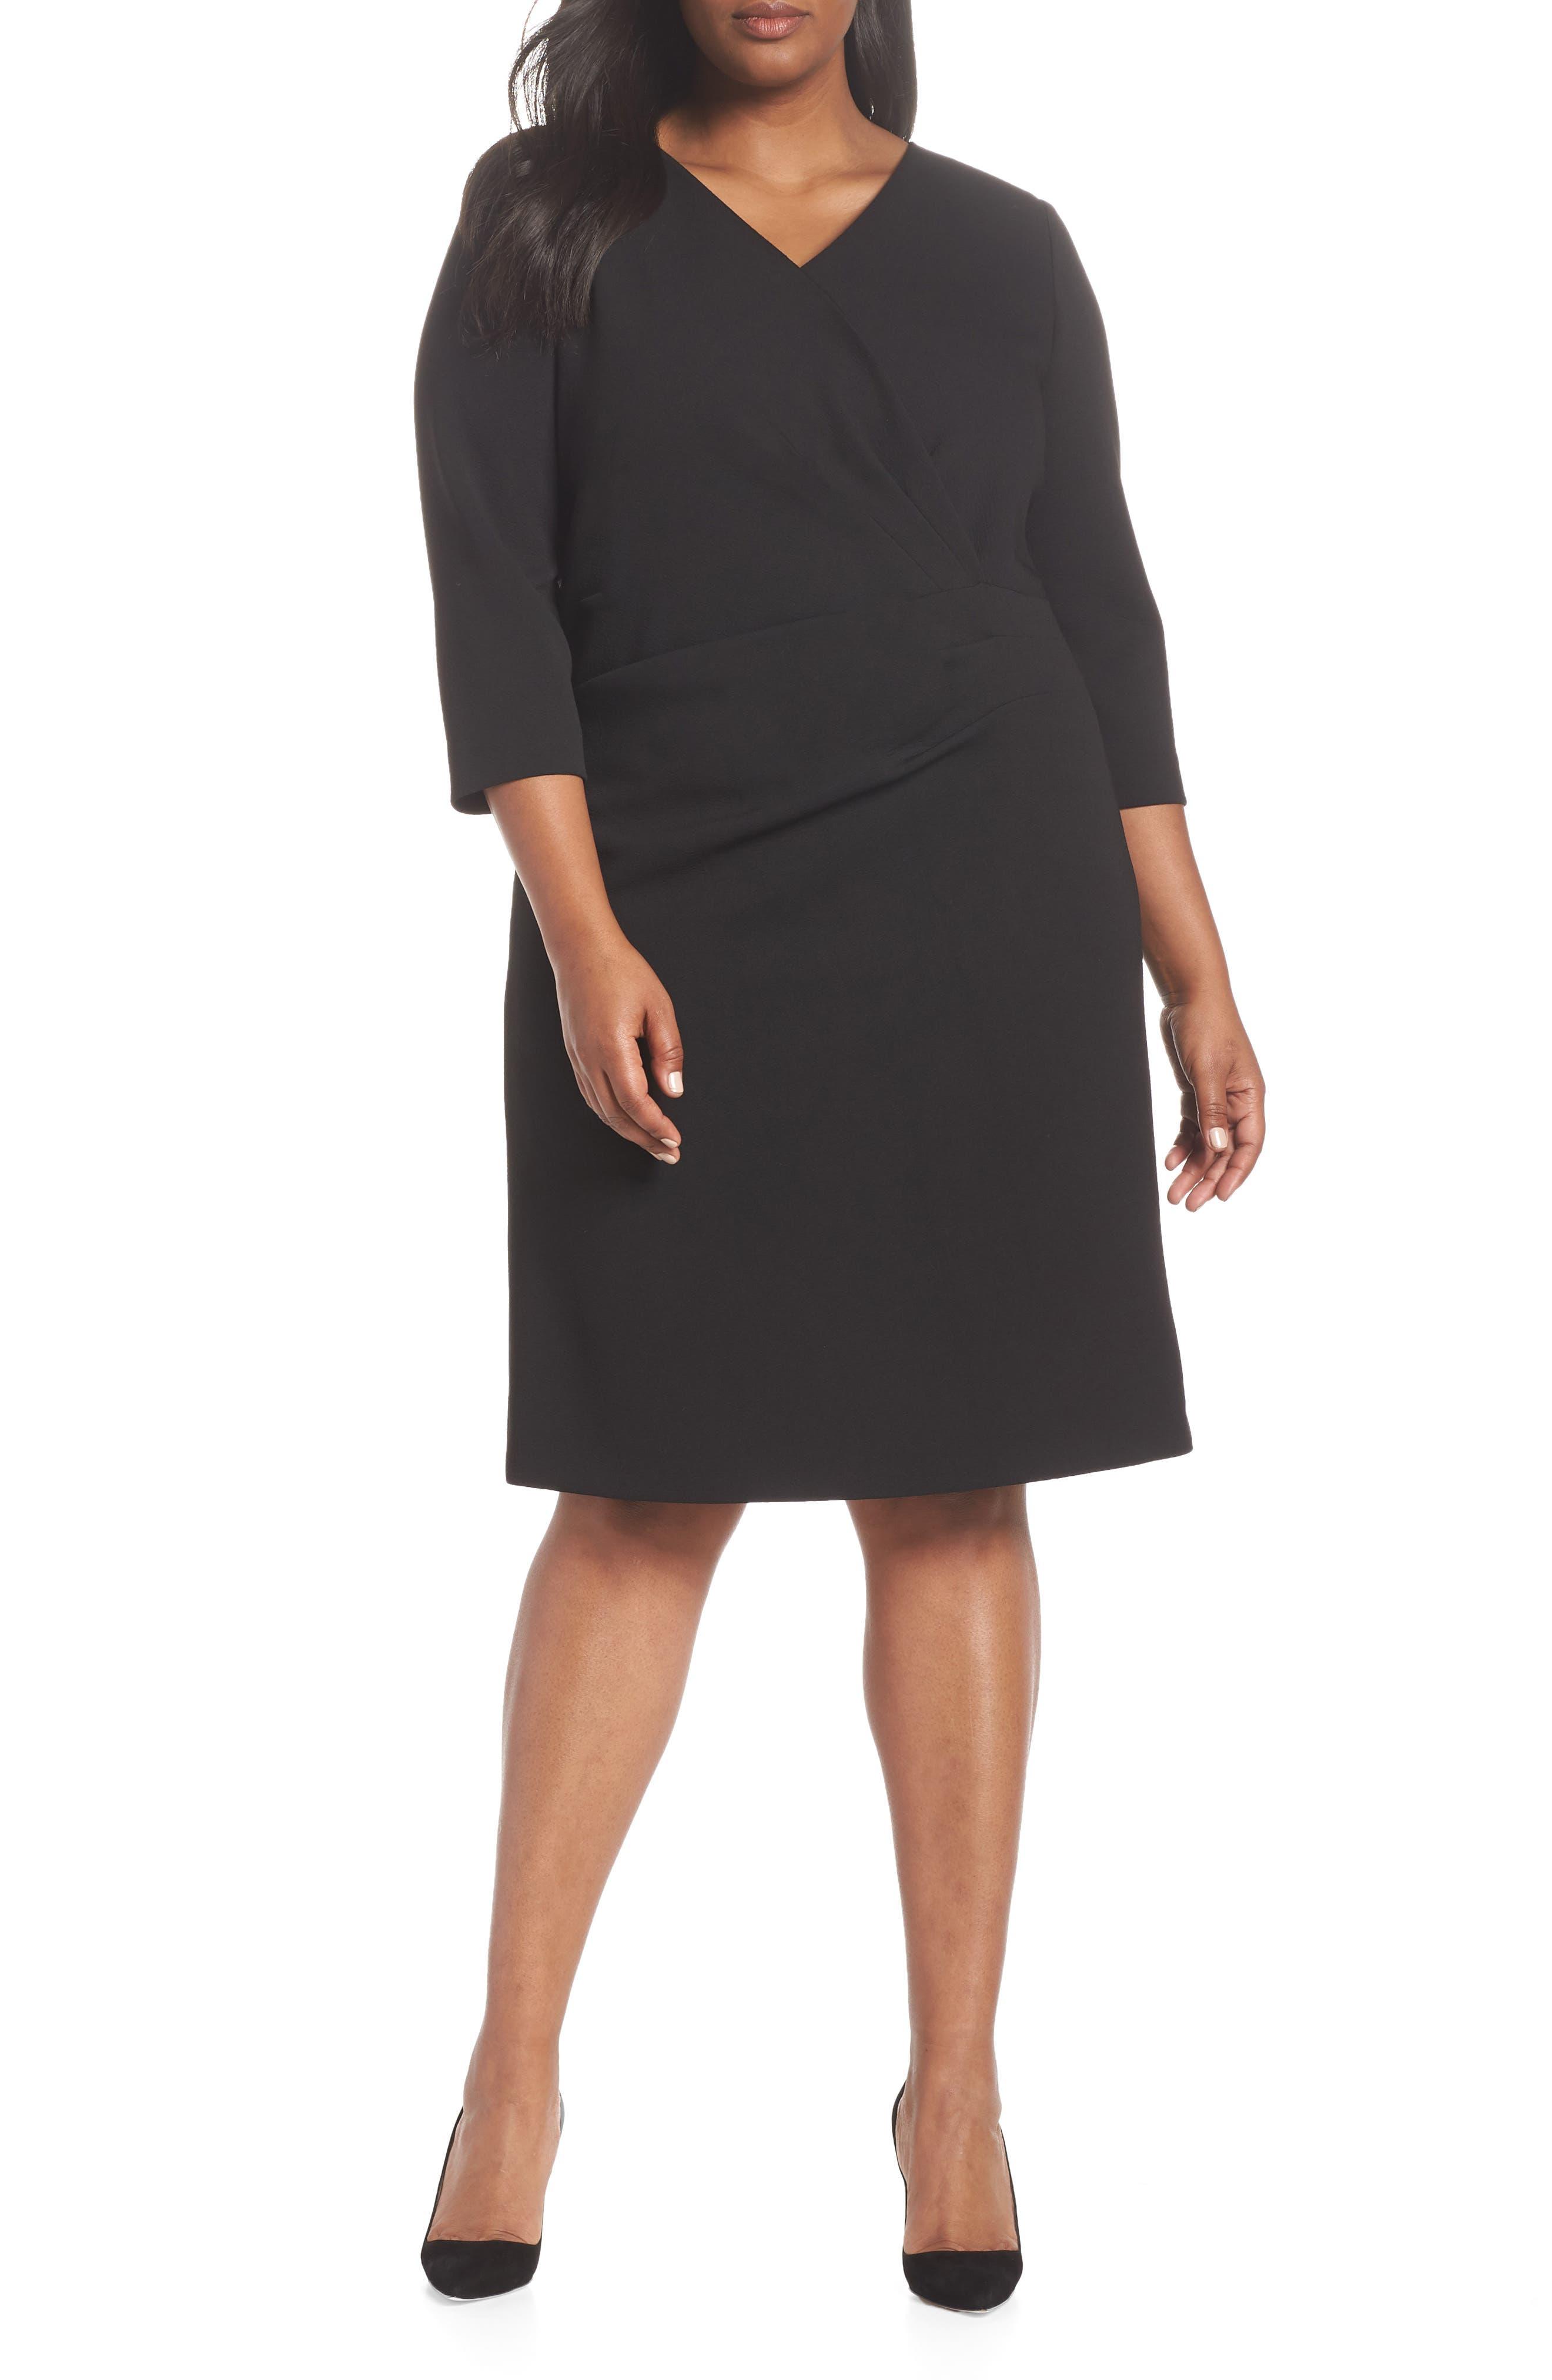 TAHARI Ruched Surplice Crepe Sheath Dress, Main, color, BLACK